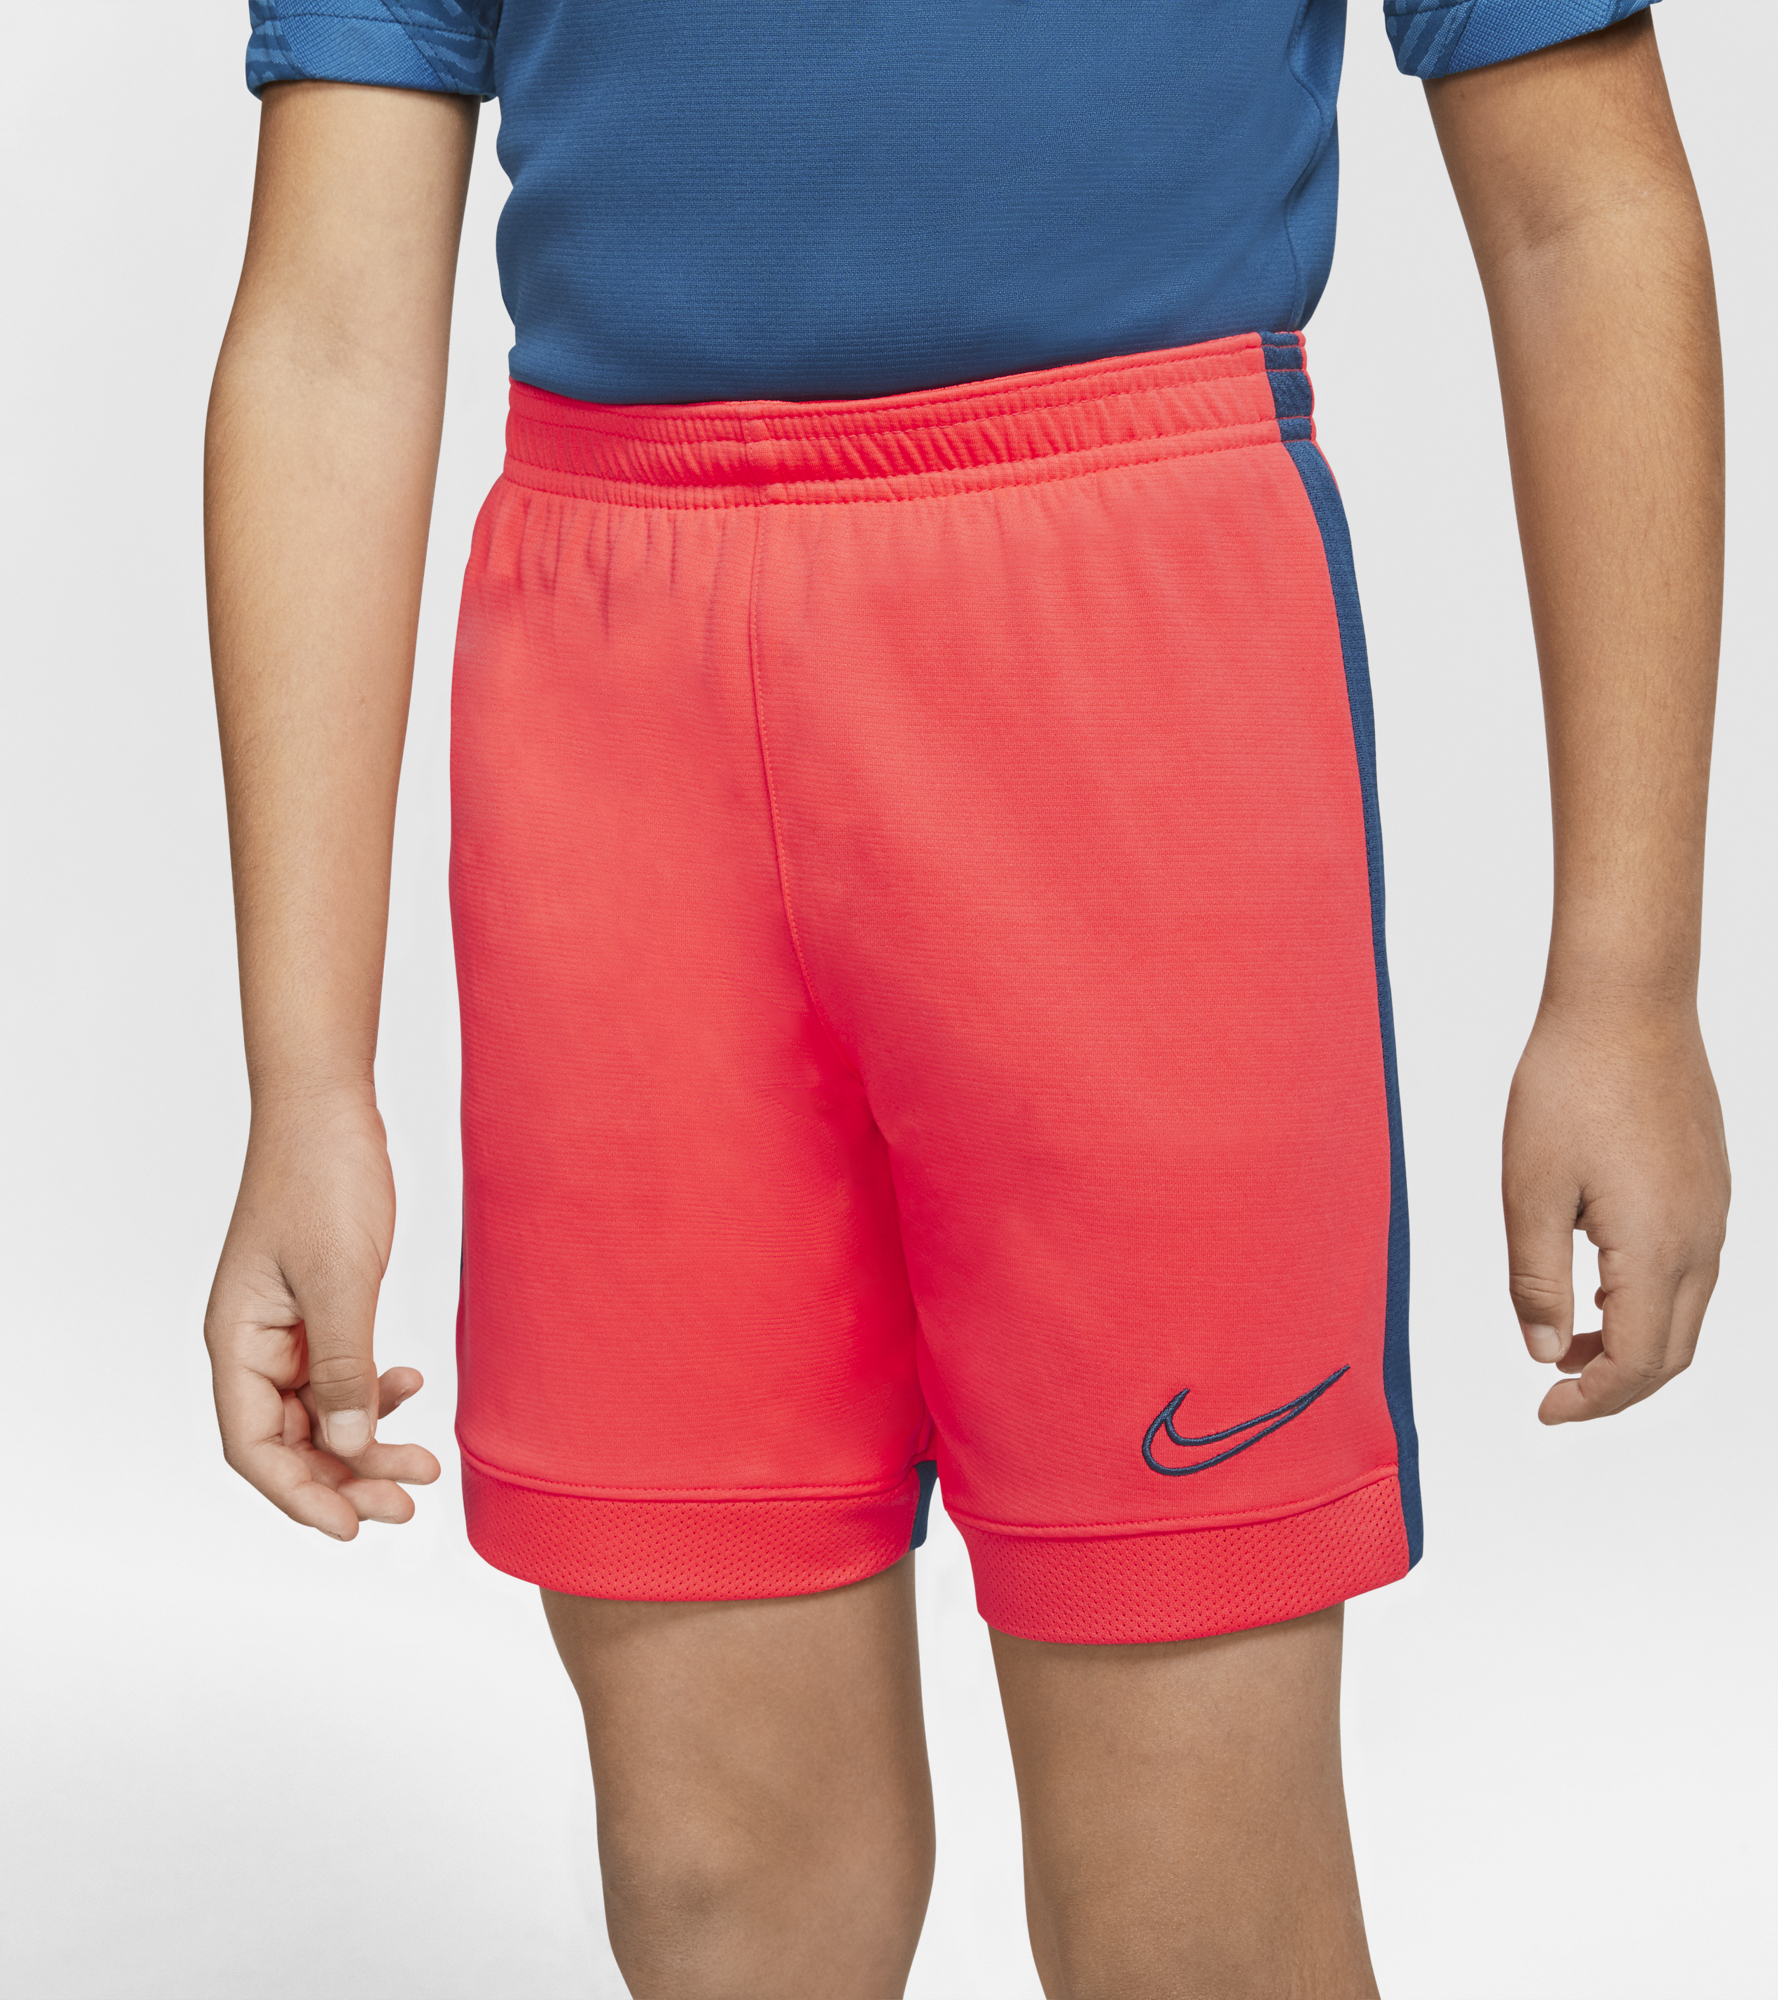 цена Nike Шорты для мальчиков Nike Dri-FIT Academy, размер 158-170 онлайн в 2017 году